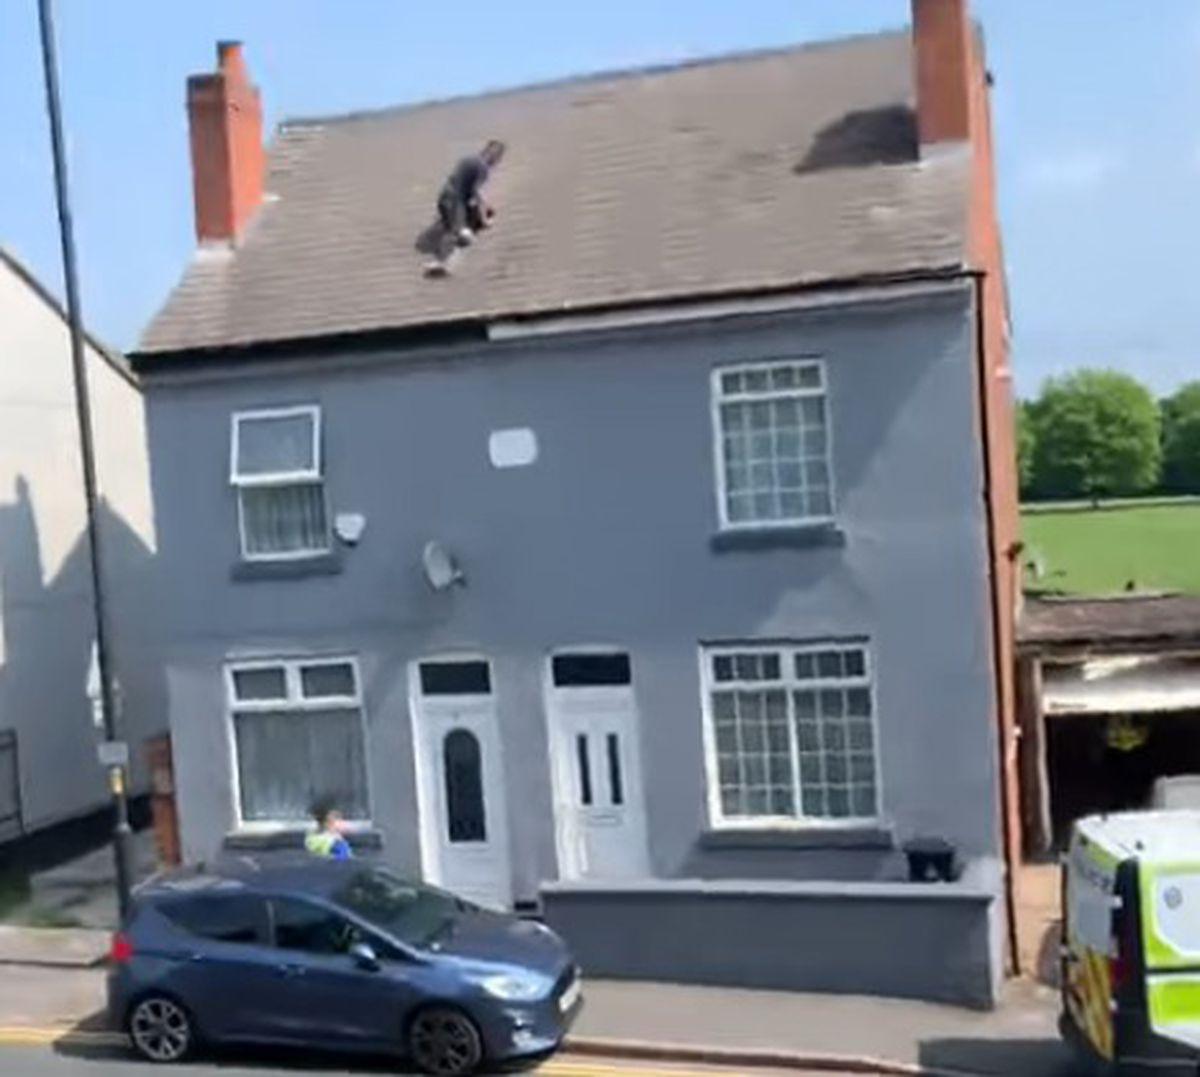 The man on the roof. Photo: Arviee Arrowsmith/Facebook